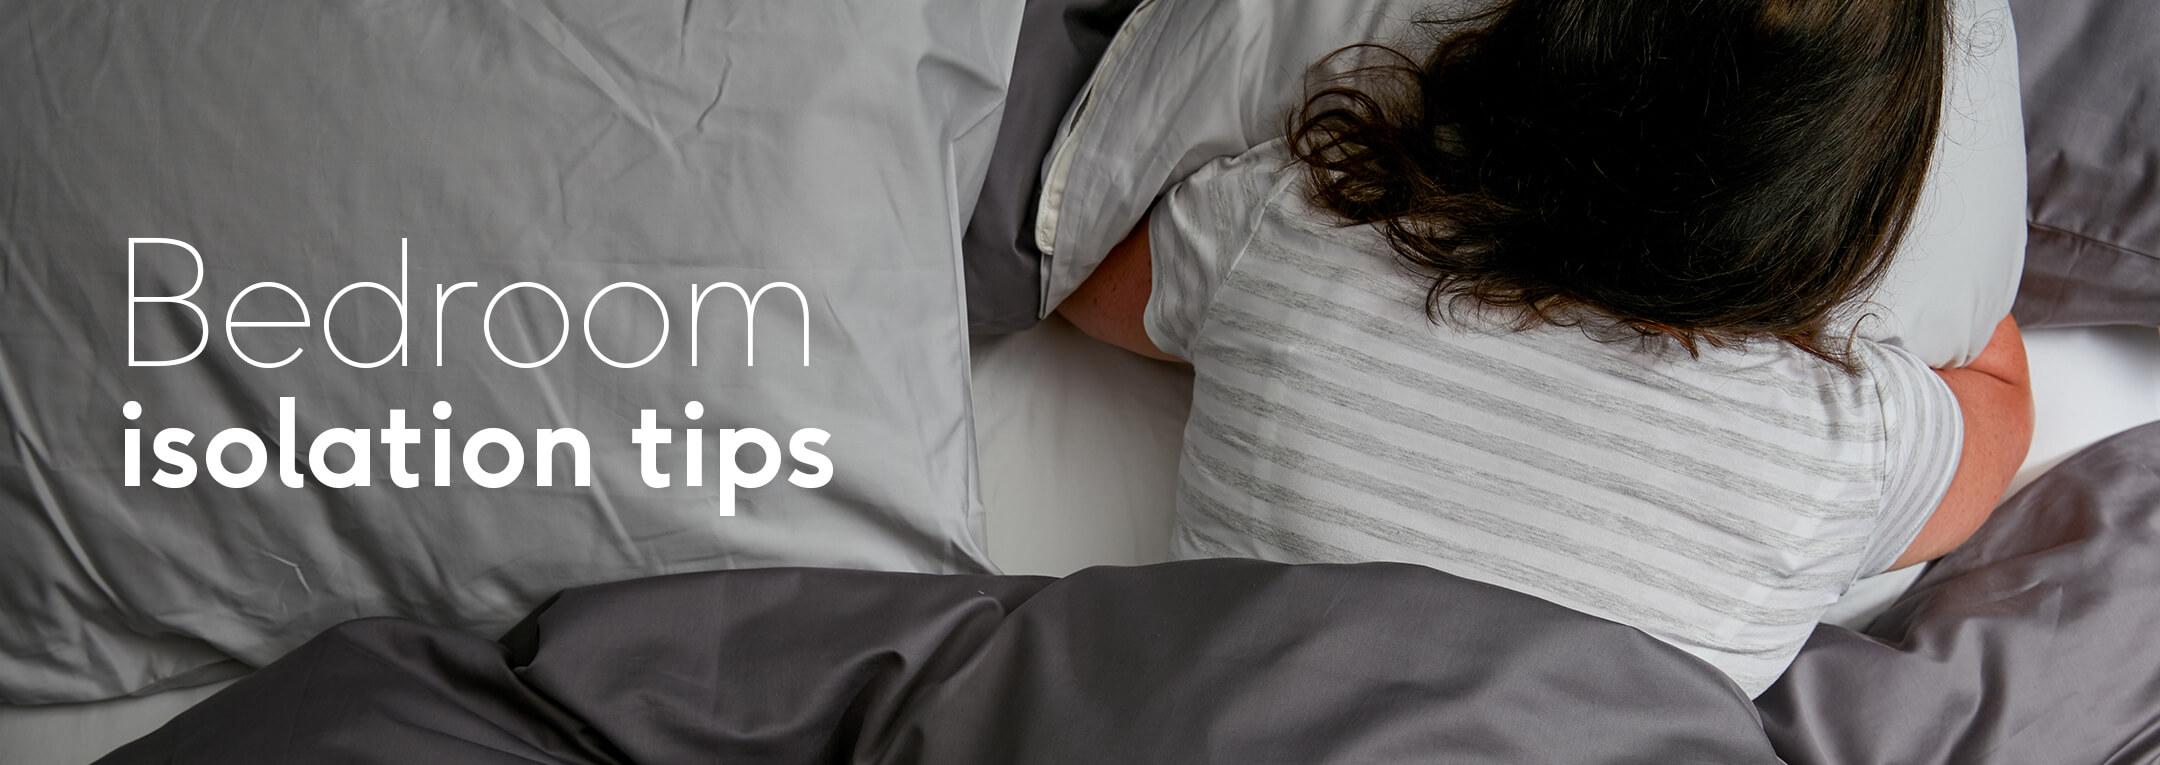 bedroom self isolation tips